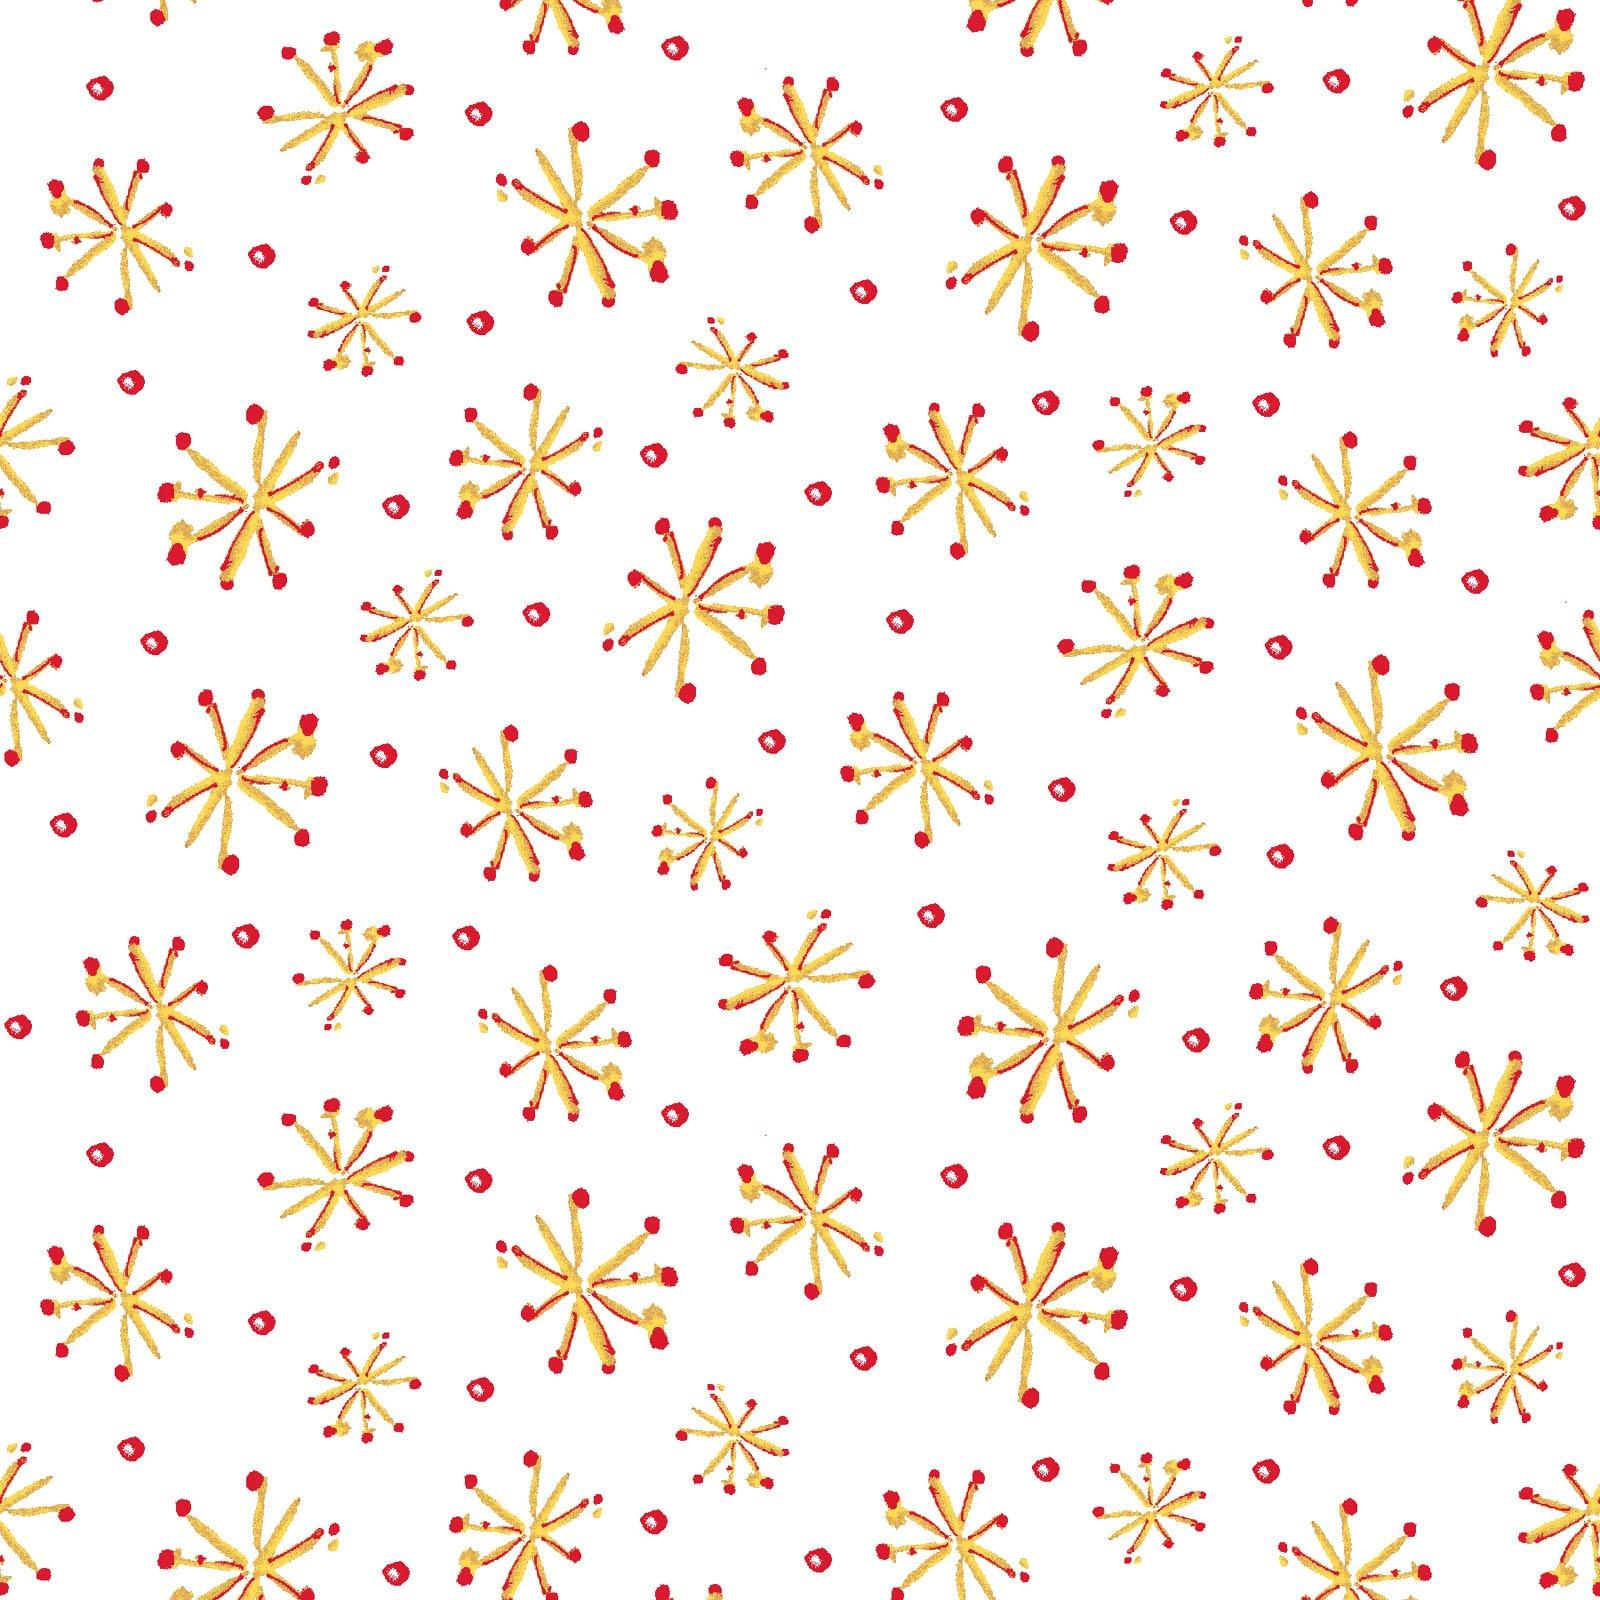 Retro Stars White<br/>Maywood Studio 9375-W